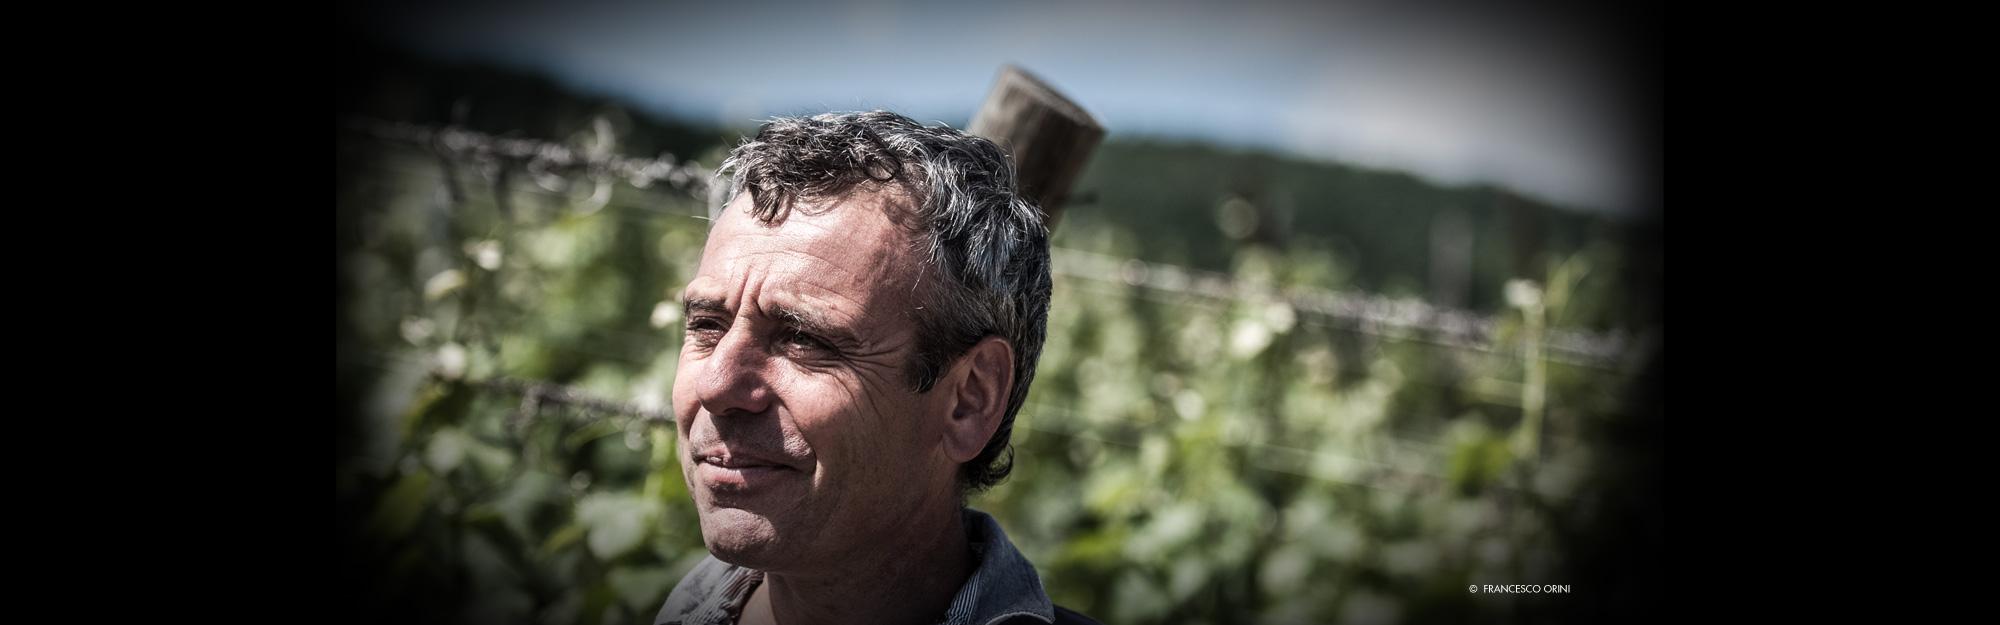 Maurizio Cavalli Distribuzione - slider